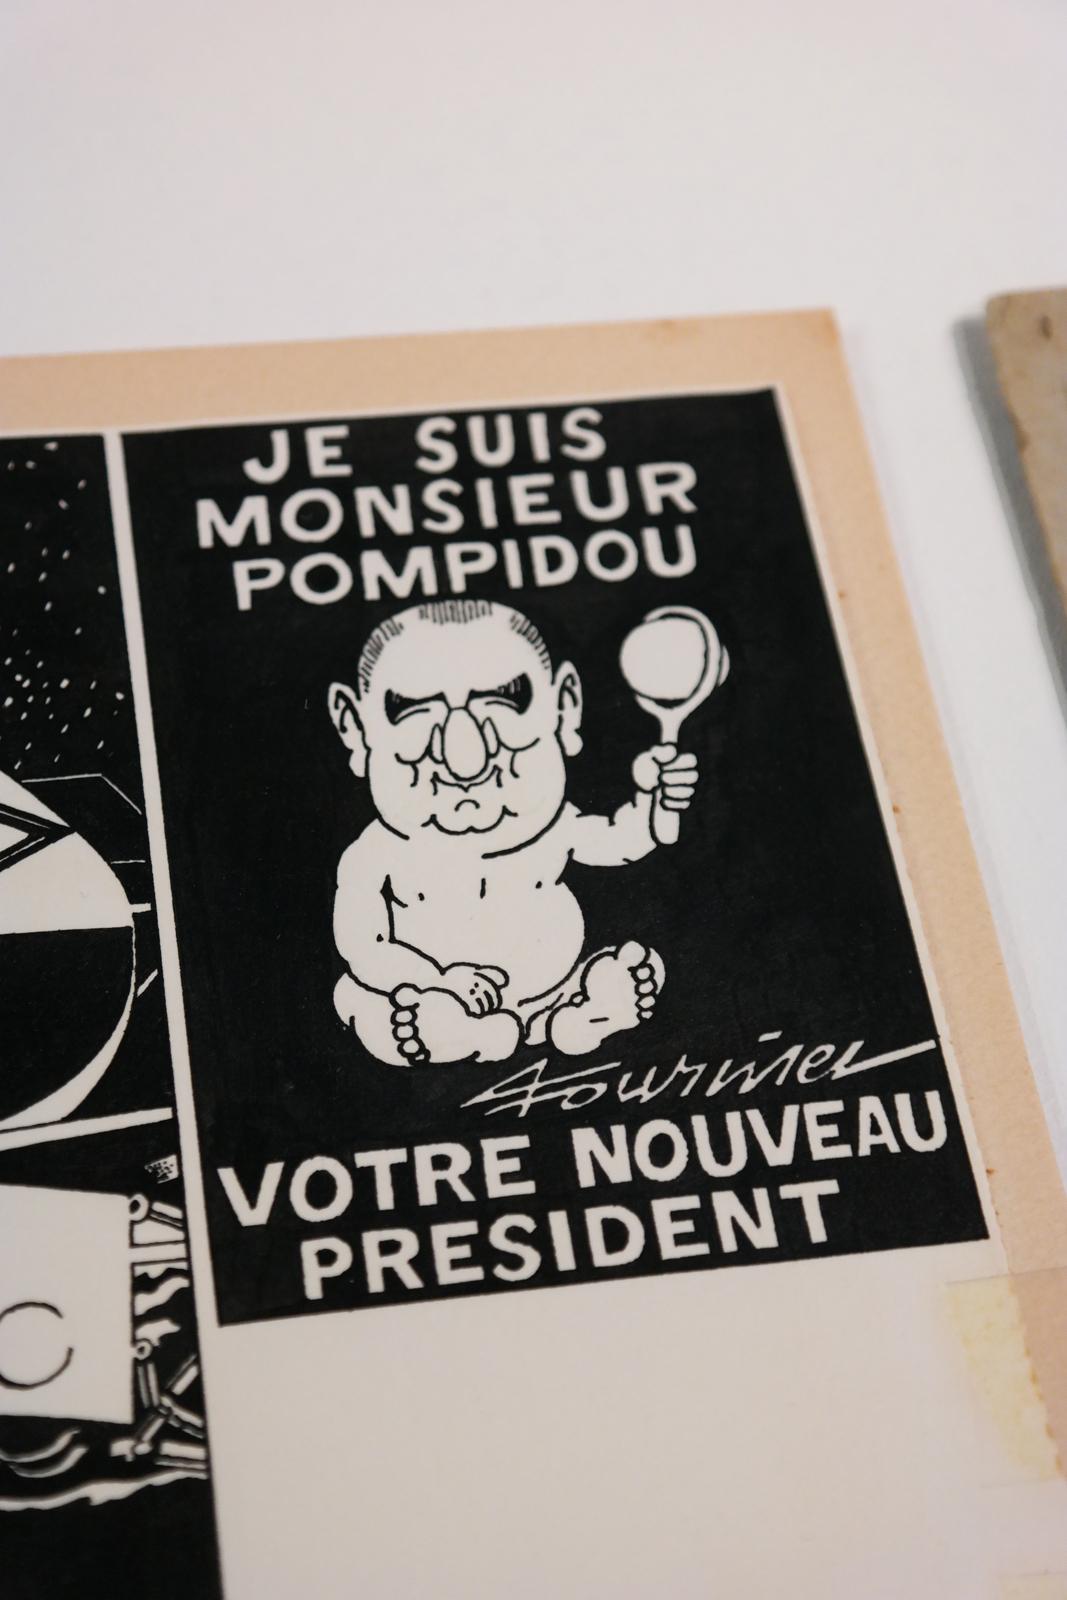 Dessin original de Pierre Fournier paru dans Hara Kiri